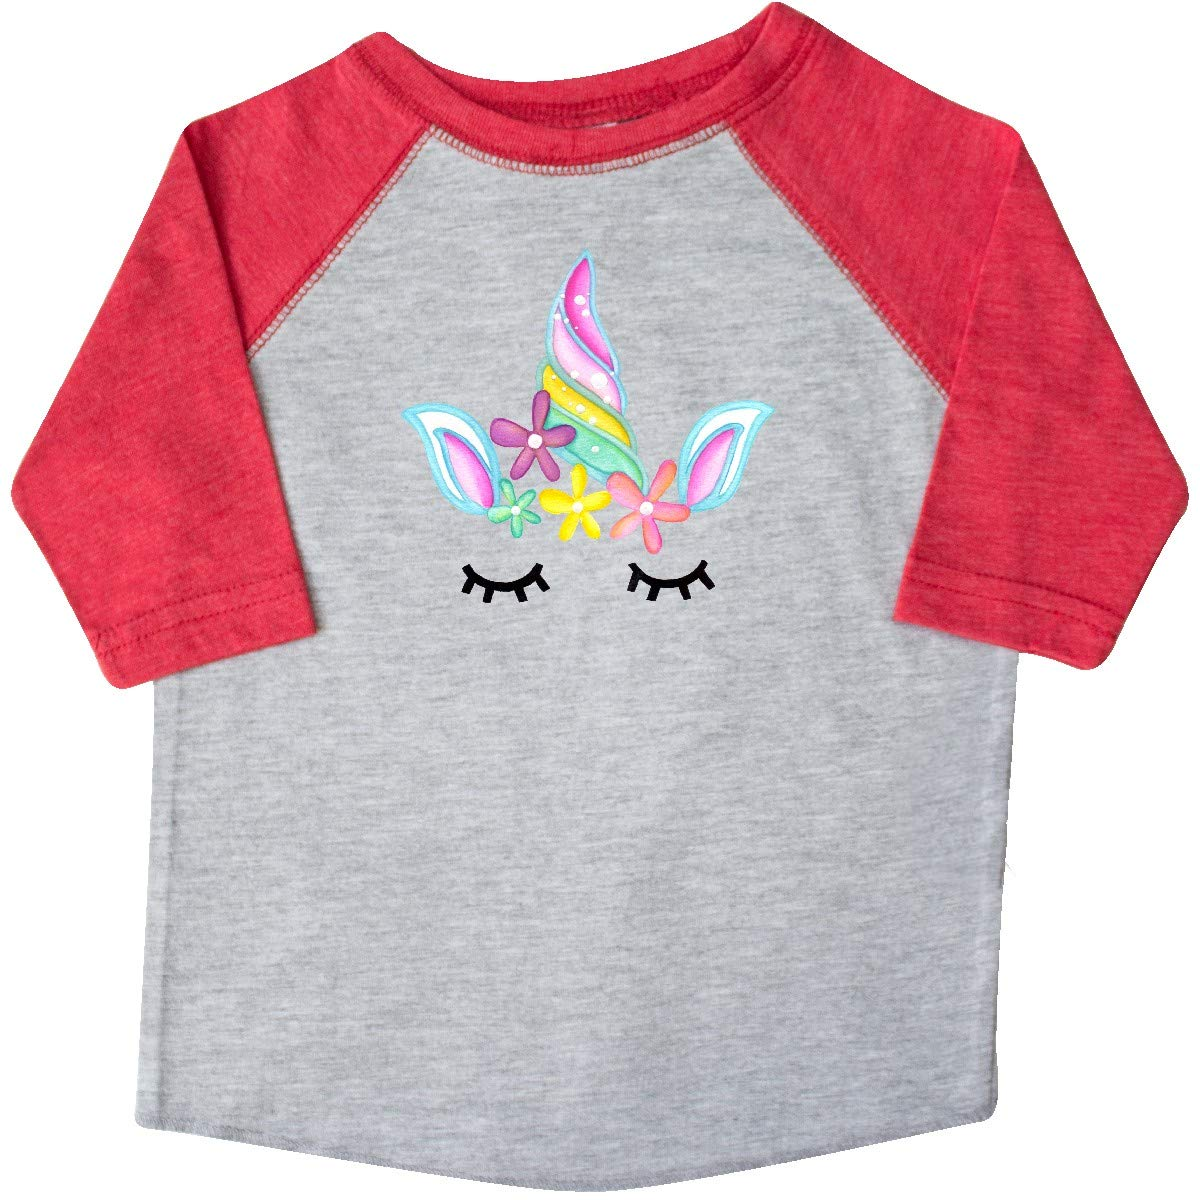 inktastic Unicorn Face Toddler T-Shirt